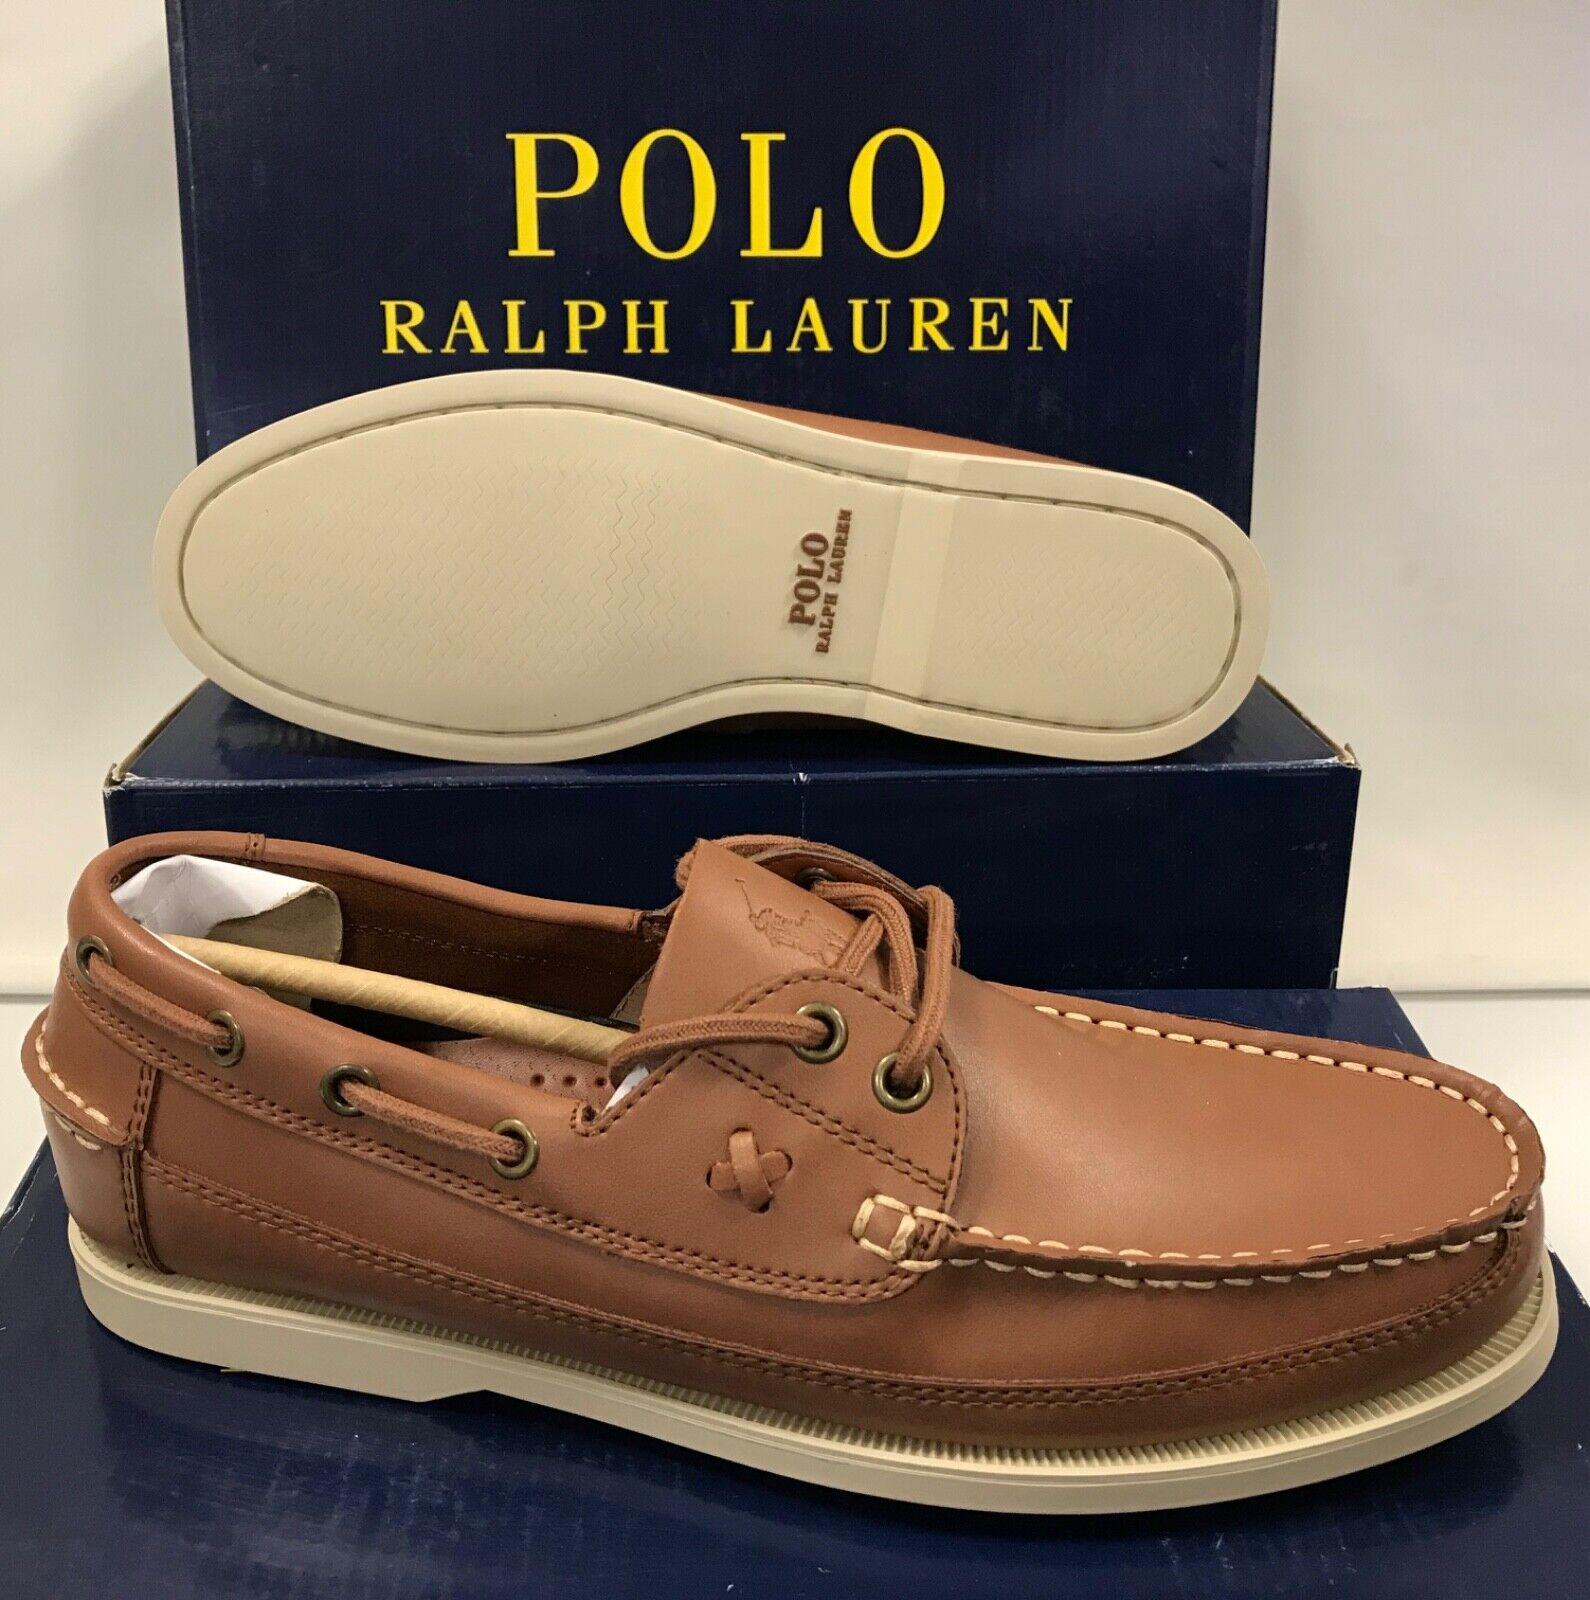 Polo Ralph Lauren Barx Mens Boat Loafers Moccasins Shoes UK 7 EUR 41